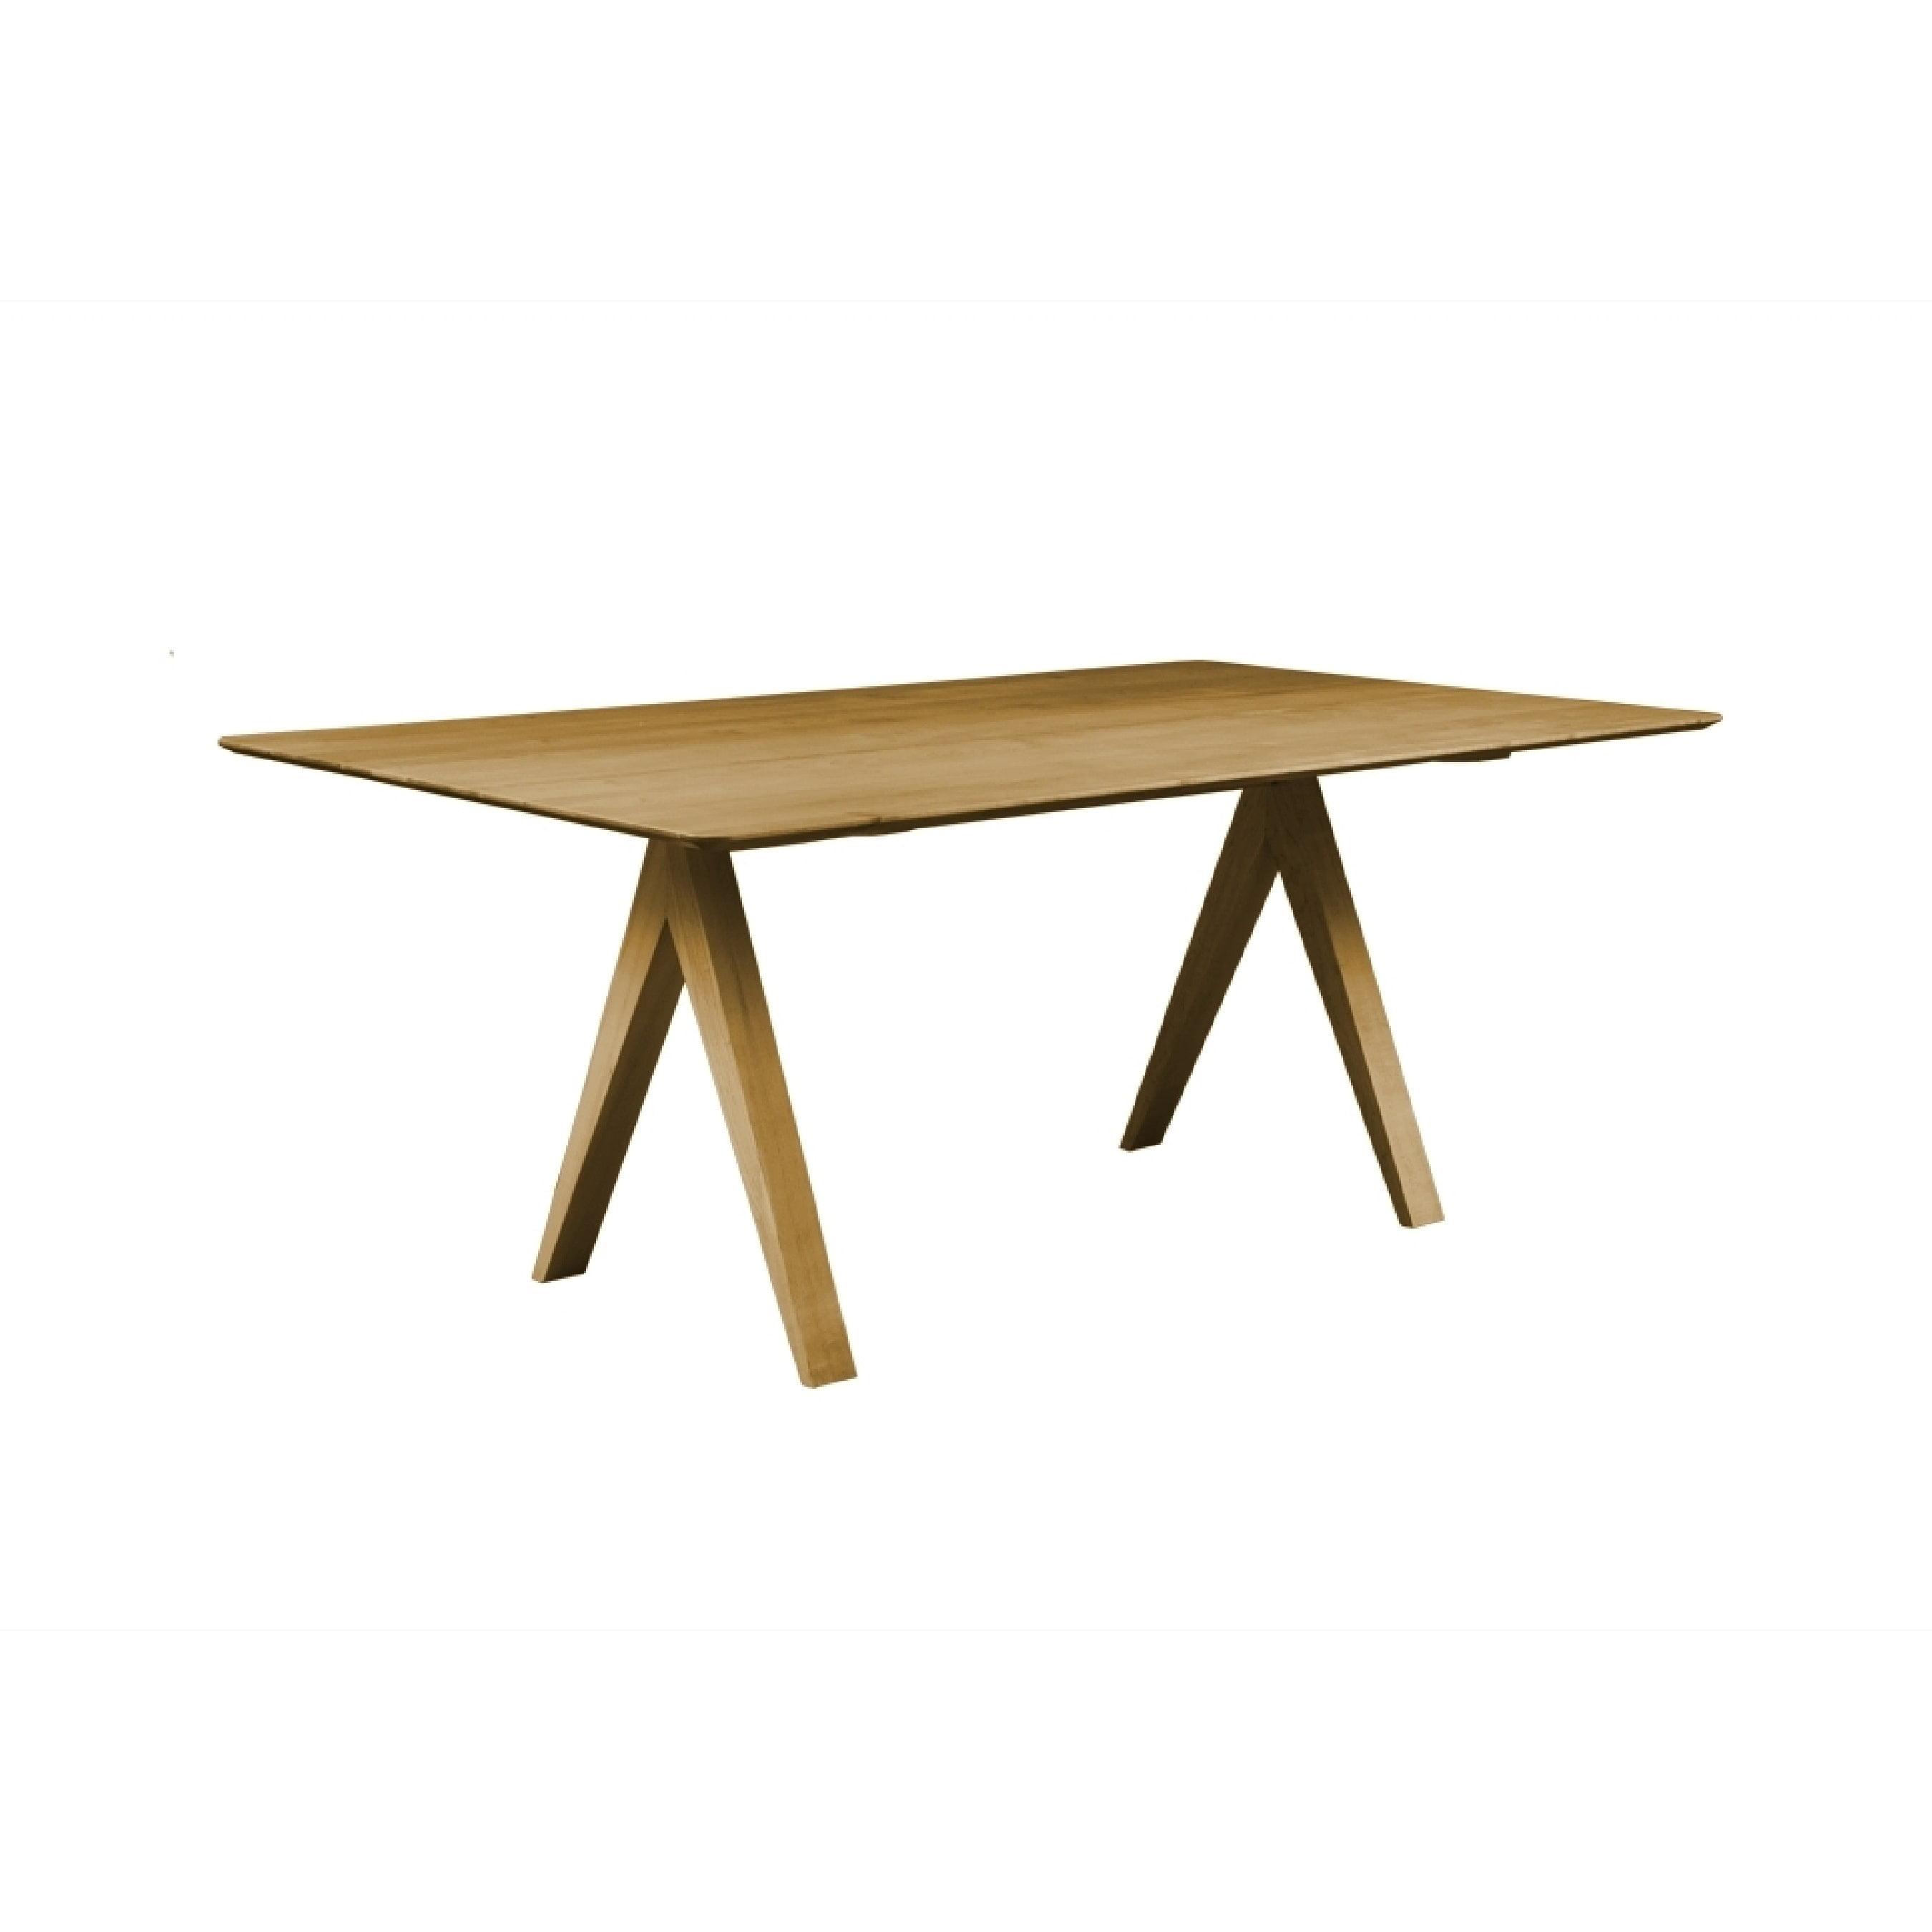 Saloom furniture saloom soma 36 x 72 rectangular maple smooth top custom dining table in flax finish walmart com